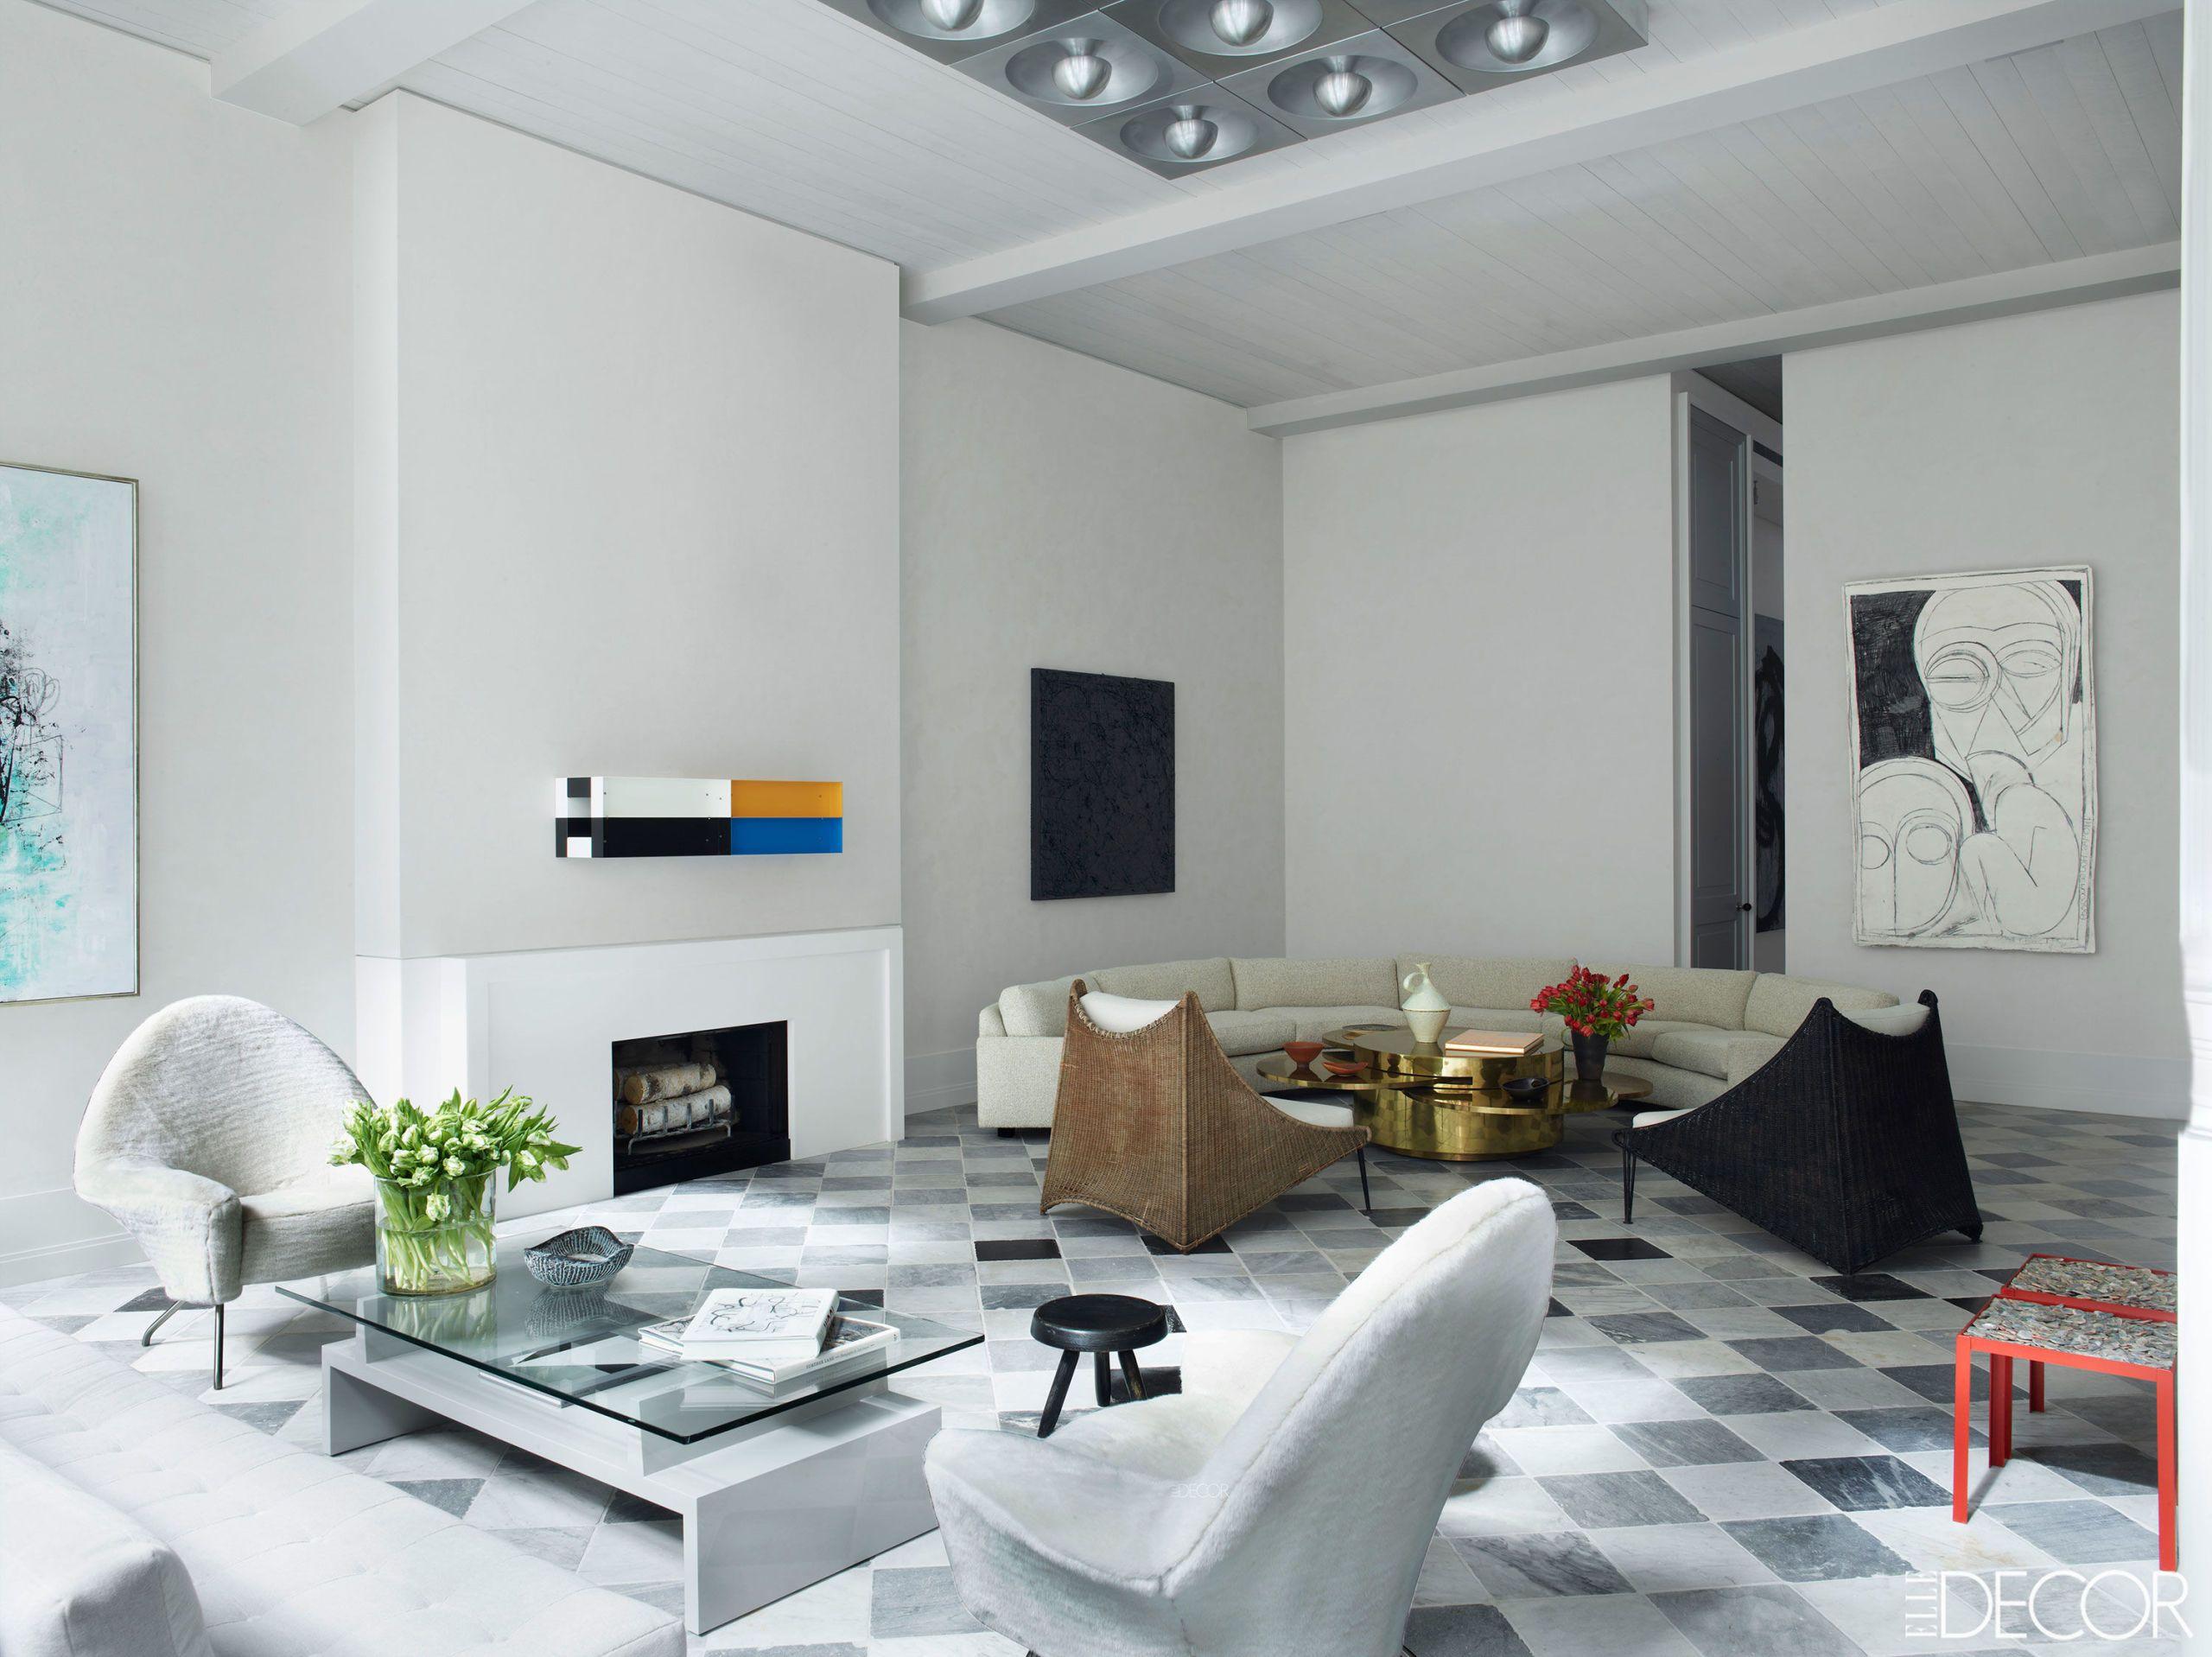 Black And White Decor. Simon Upton. Black And White Living Room